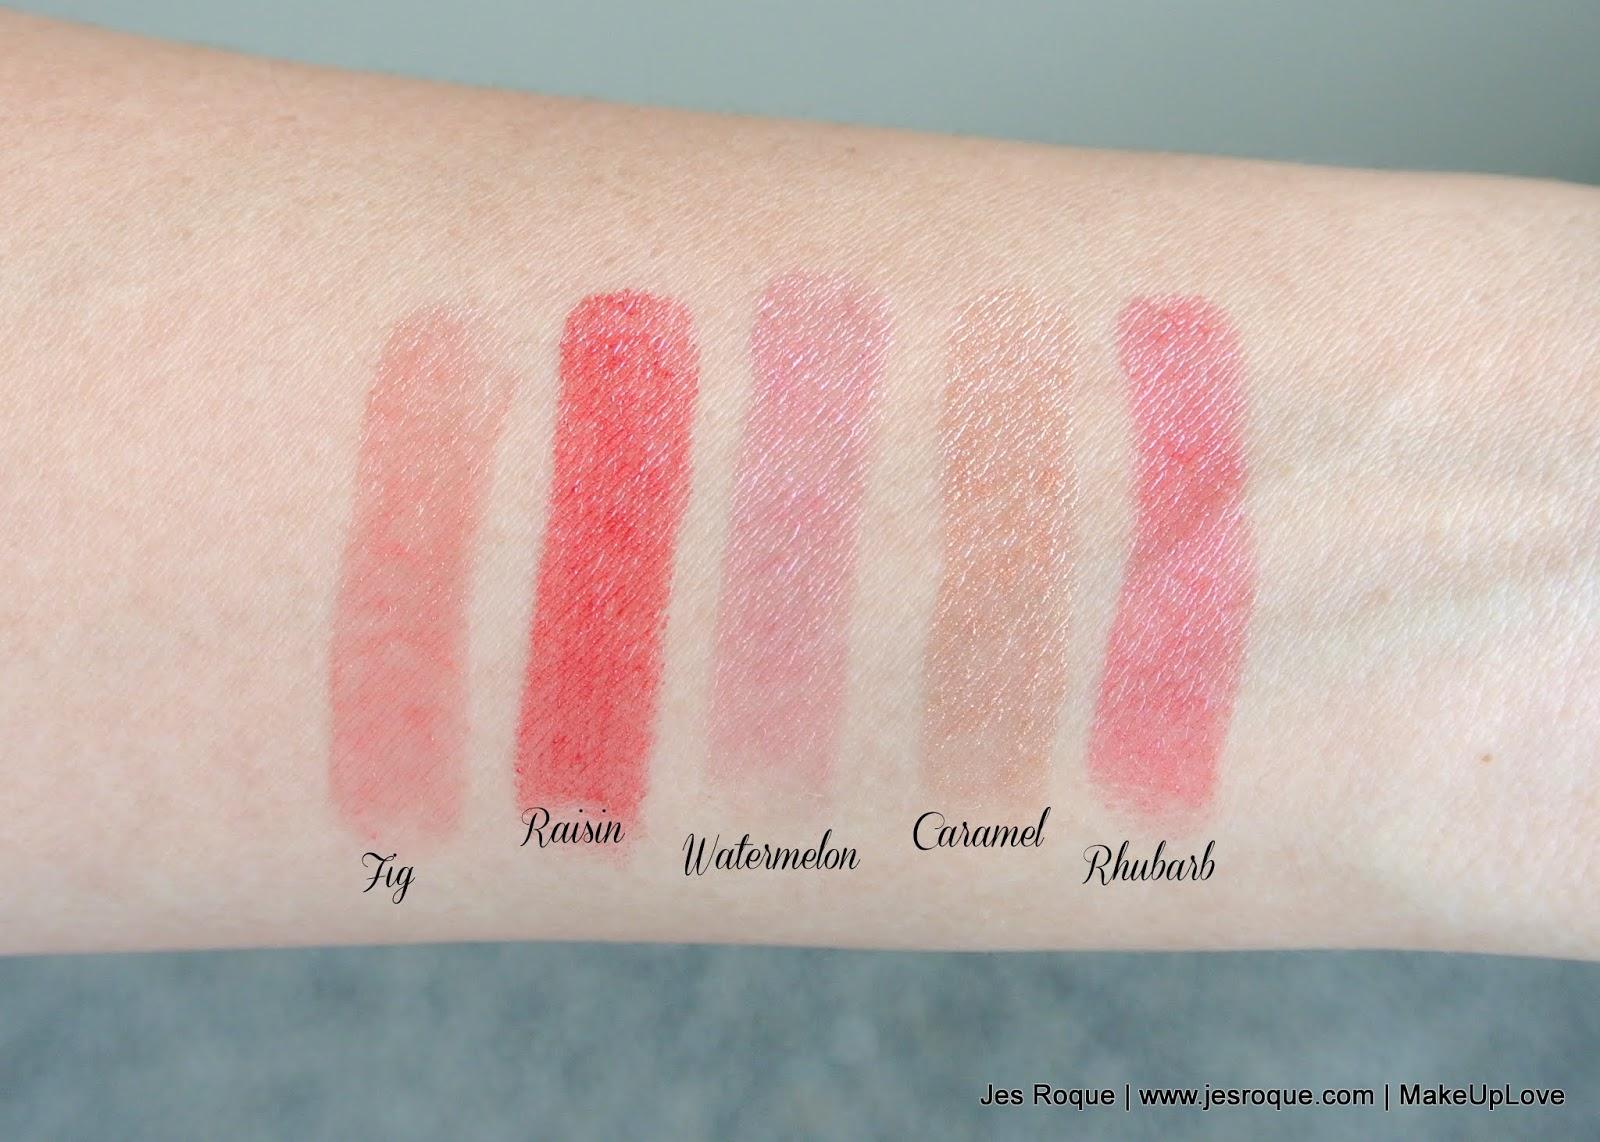 Tinted Lip Balm by Burt's Bees #5